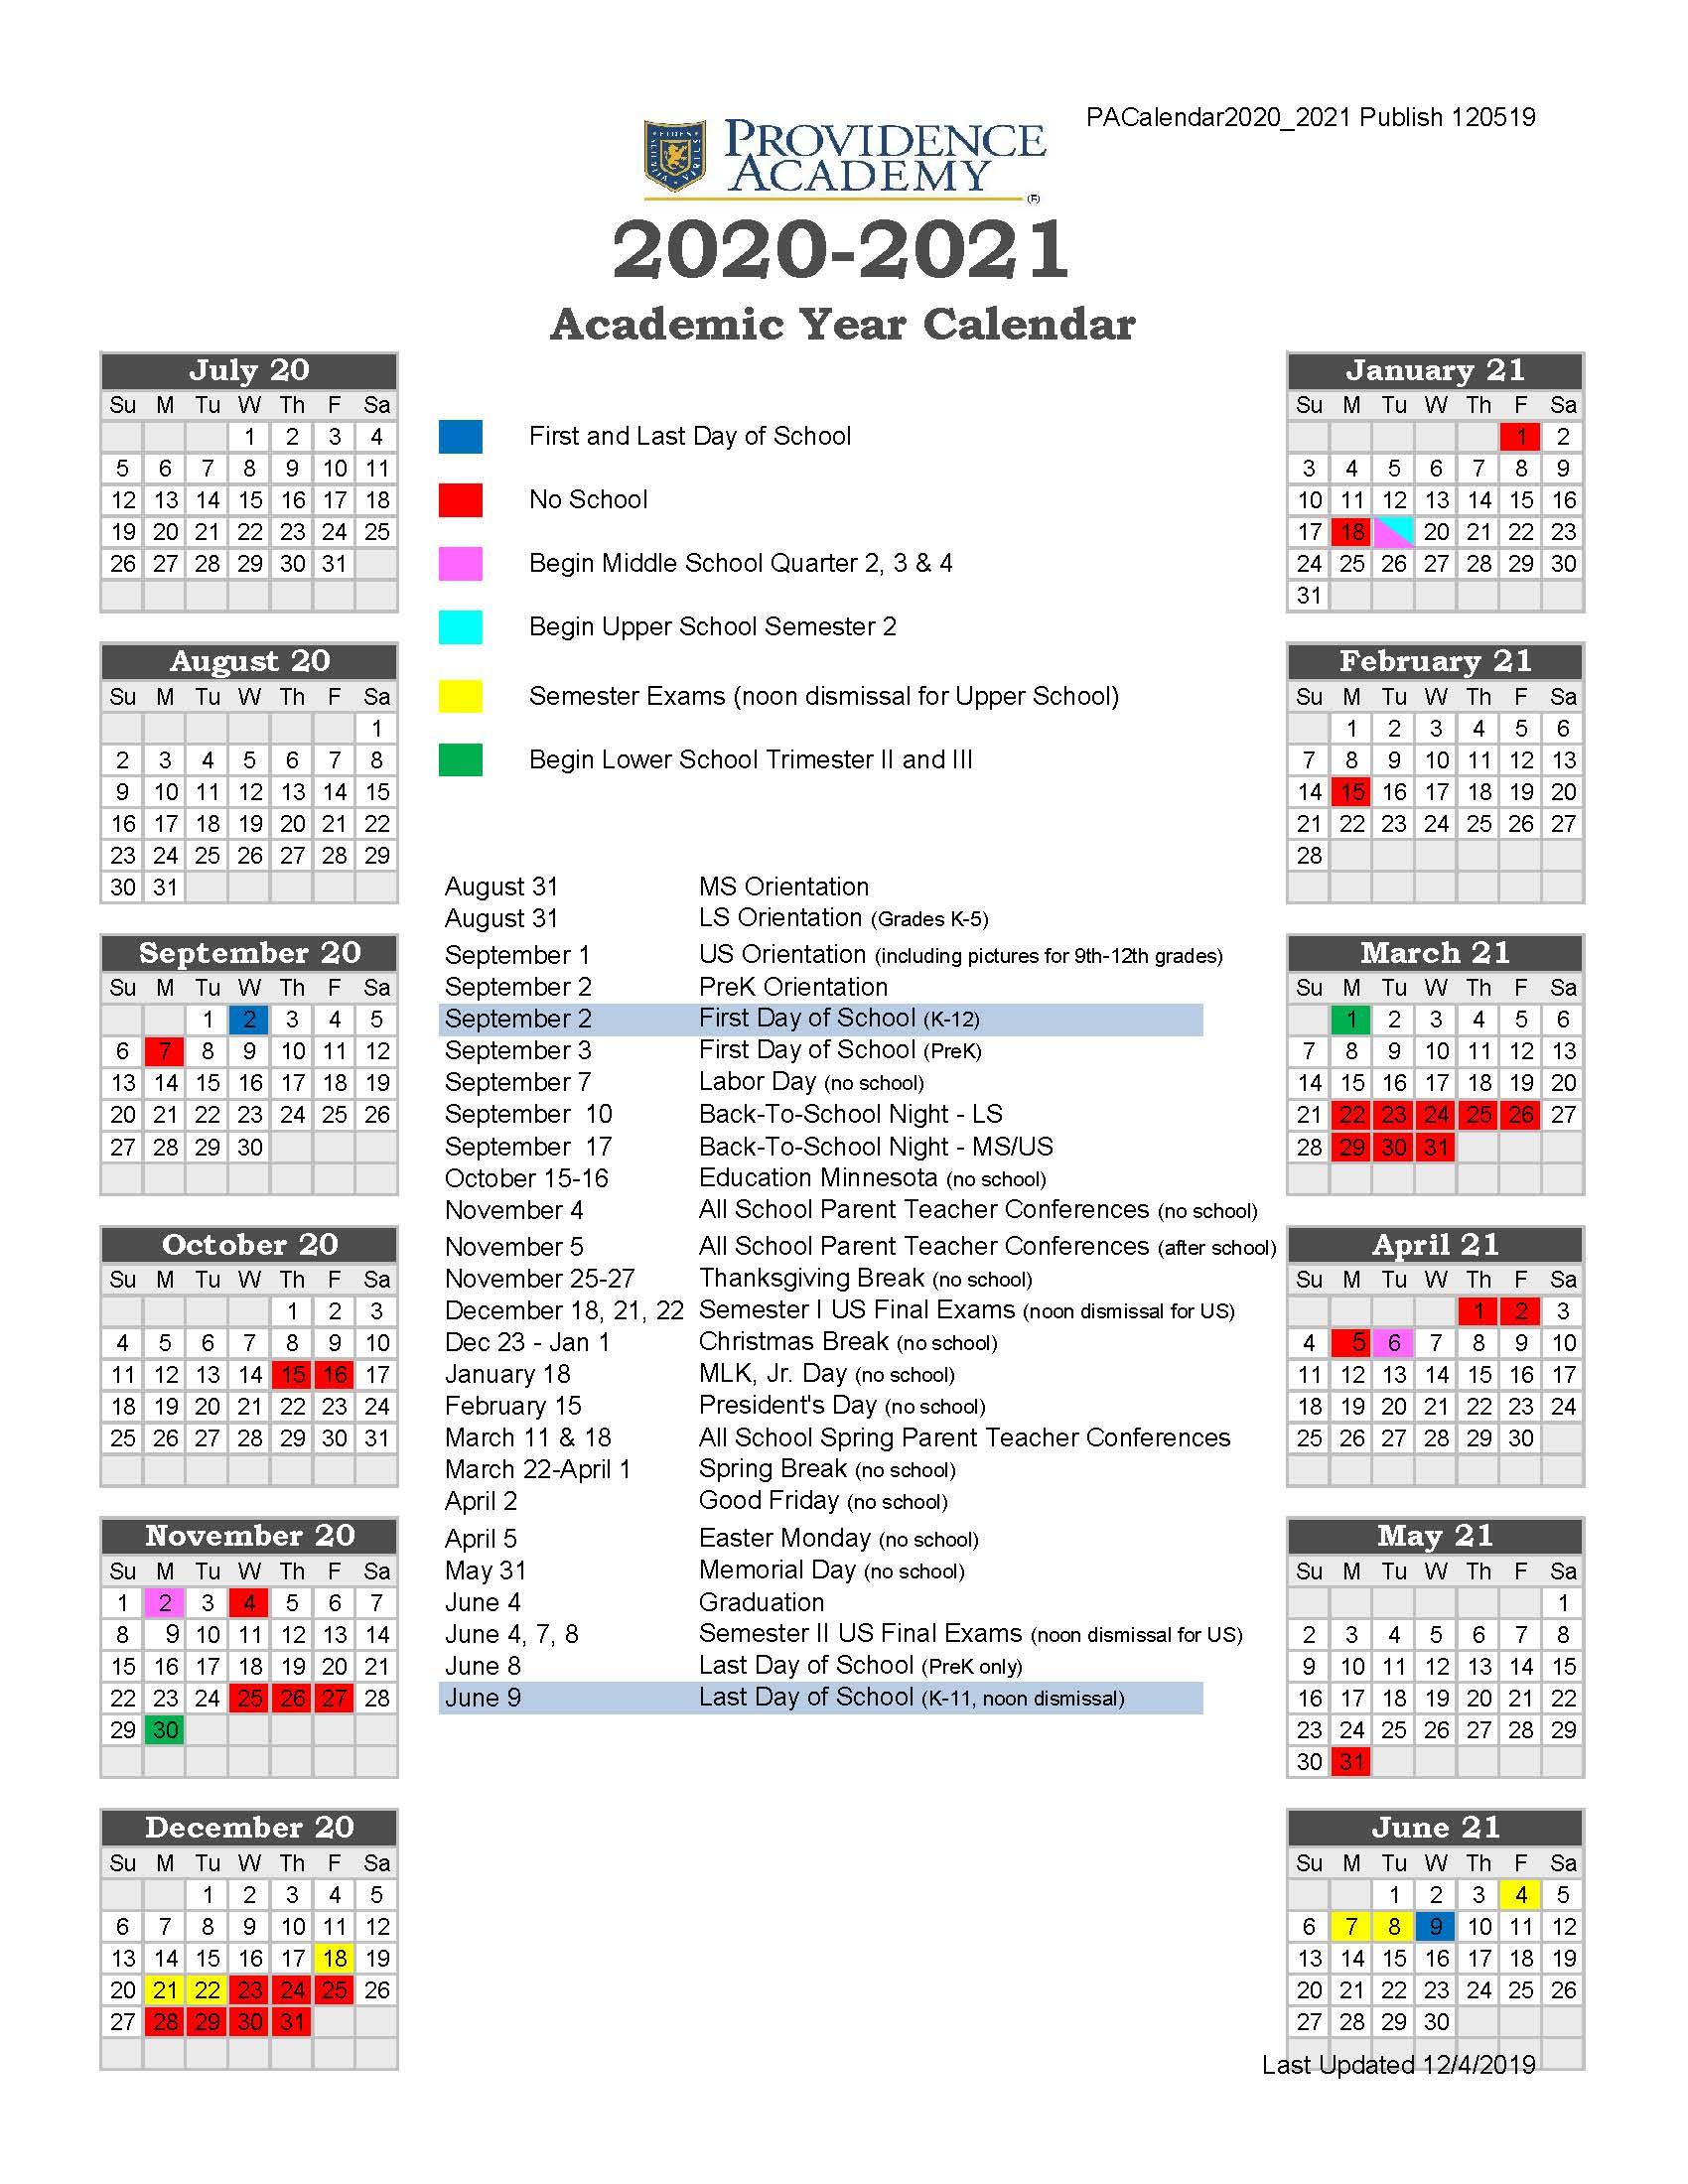 Academic Calendar - Providence Academy in Univ Of Mn Academic Calendar Twin City Campus